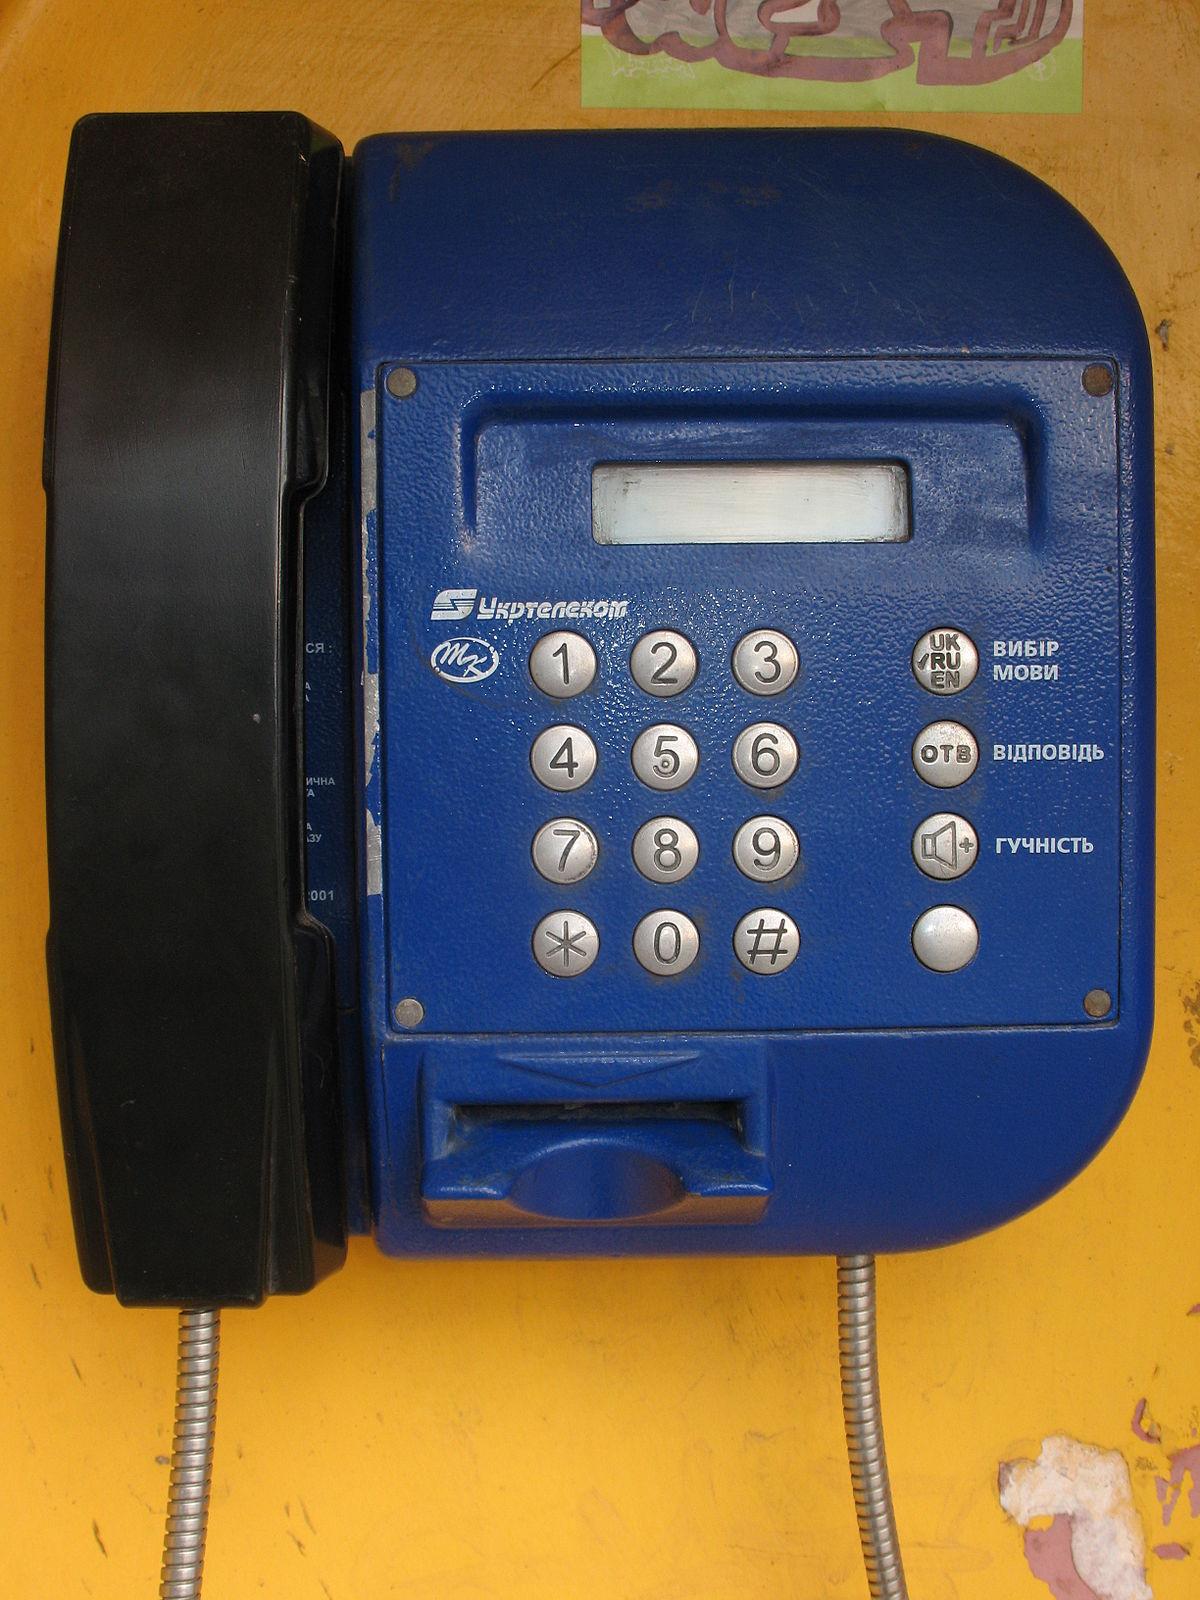 «Укртелеком» припинить надавати послуги зв'язку через таксофони